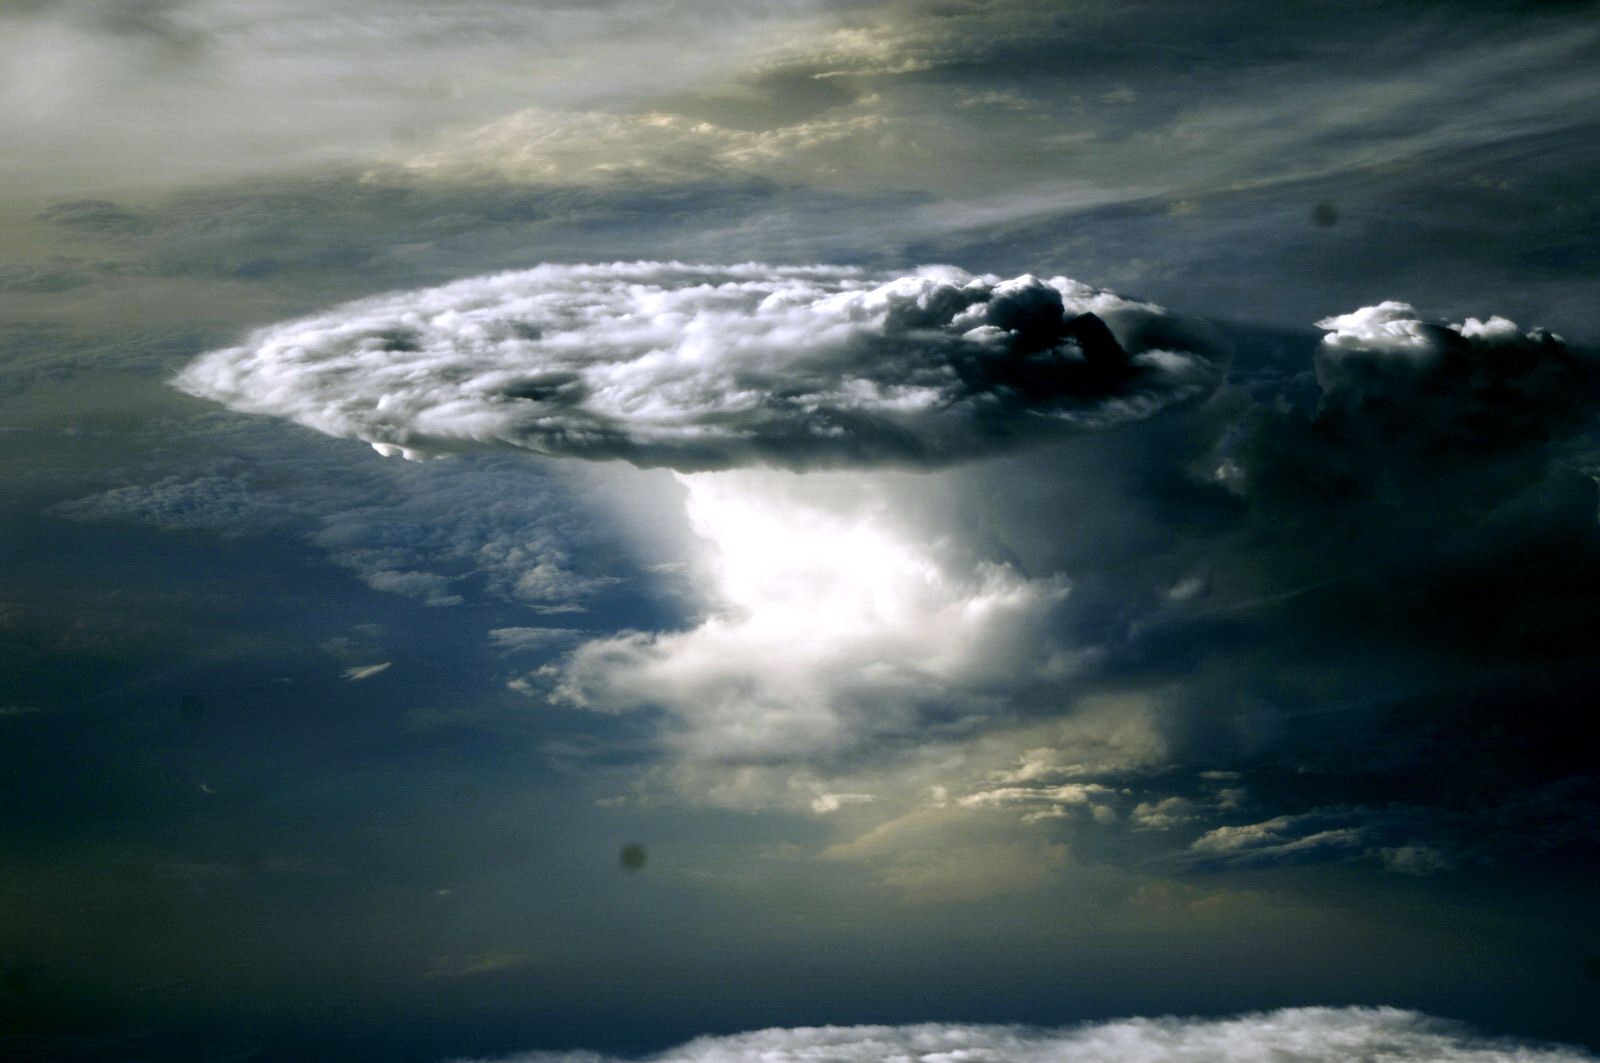 http://3.bp.blogspot.com/-ScdO1AE0Z4M/TgUBVo6oVJI/AAAAAAAAAi8/9k4RSIo8sLw/s1600/moon_cloud_b_03.JPG